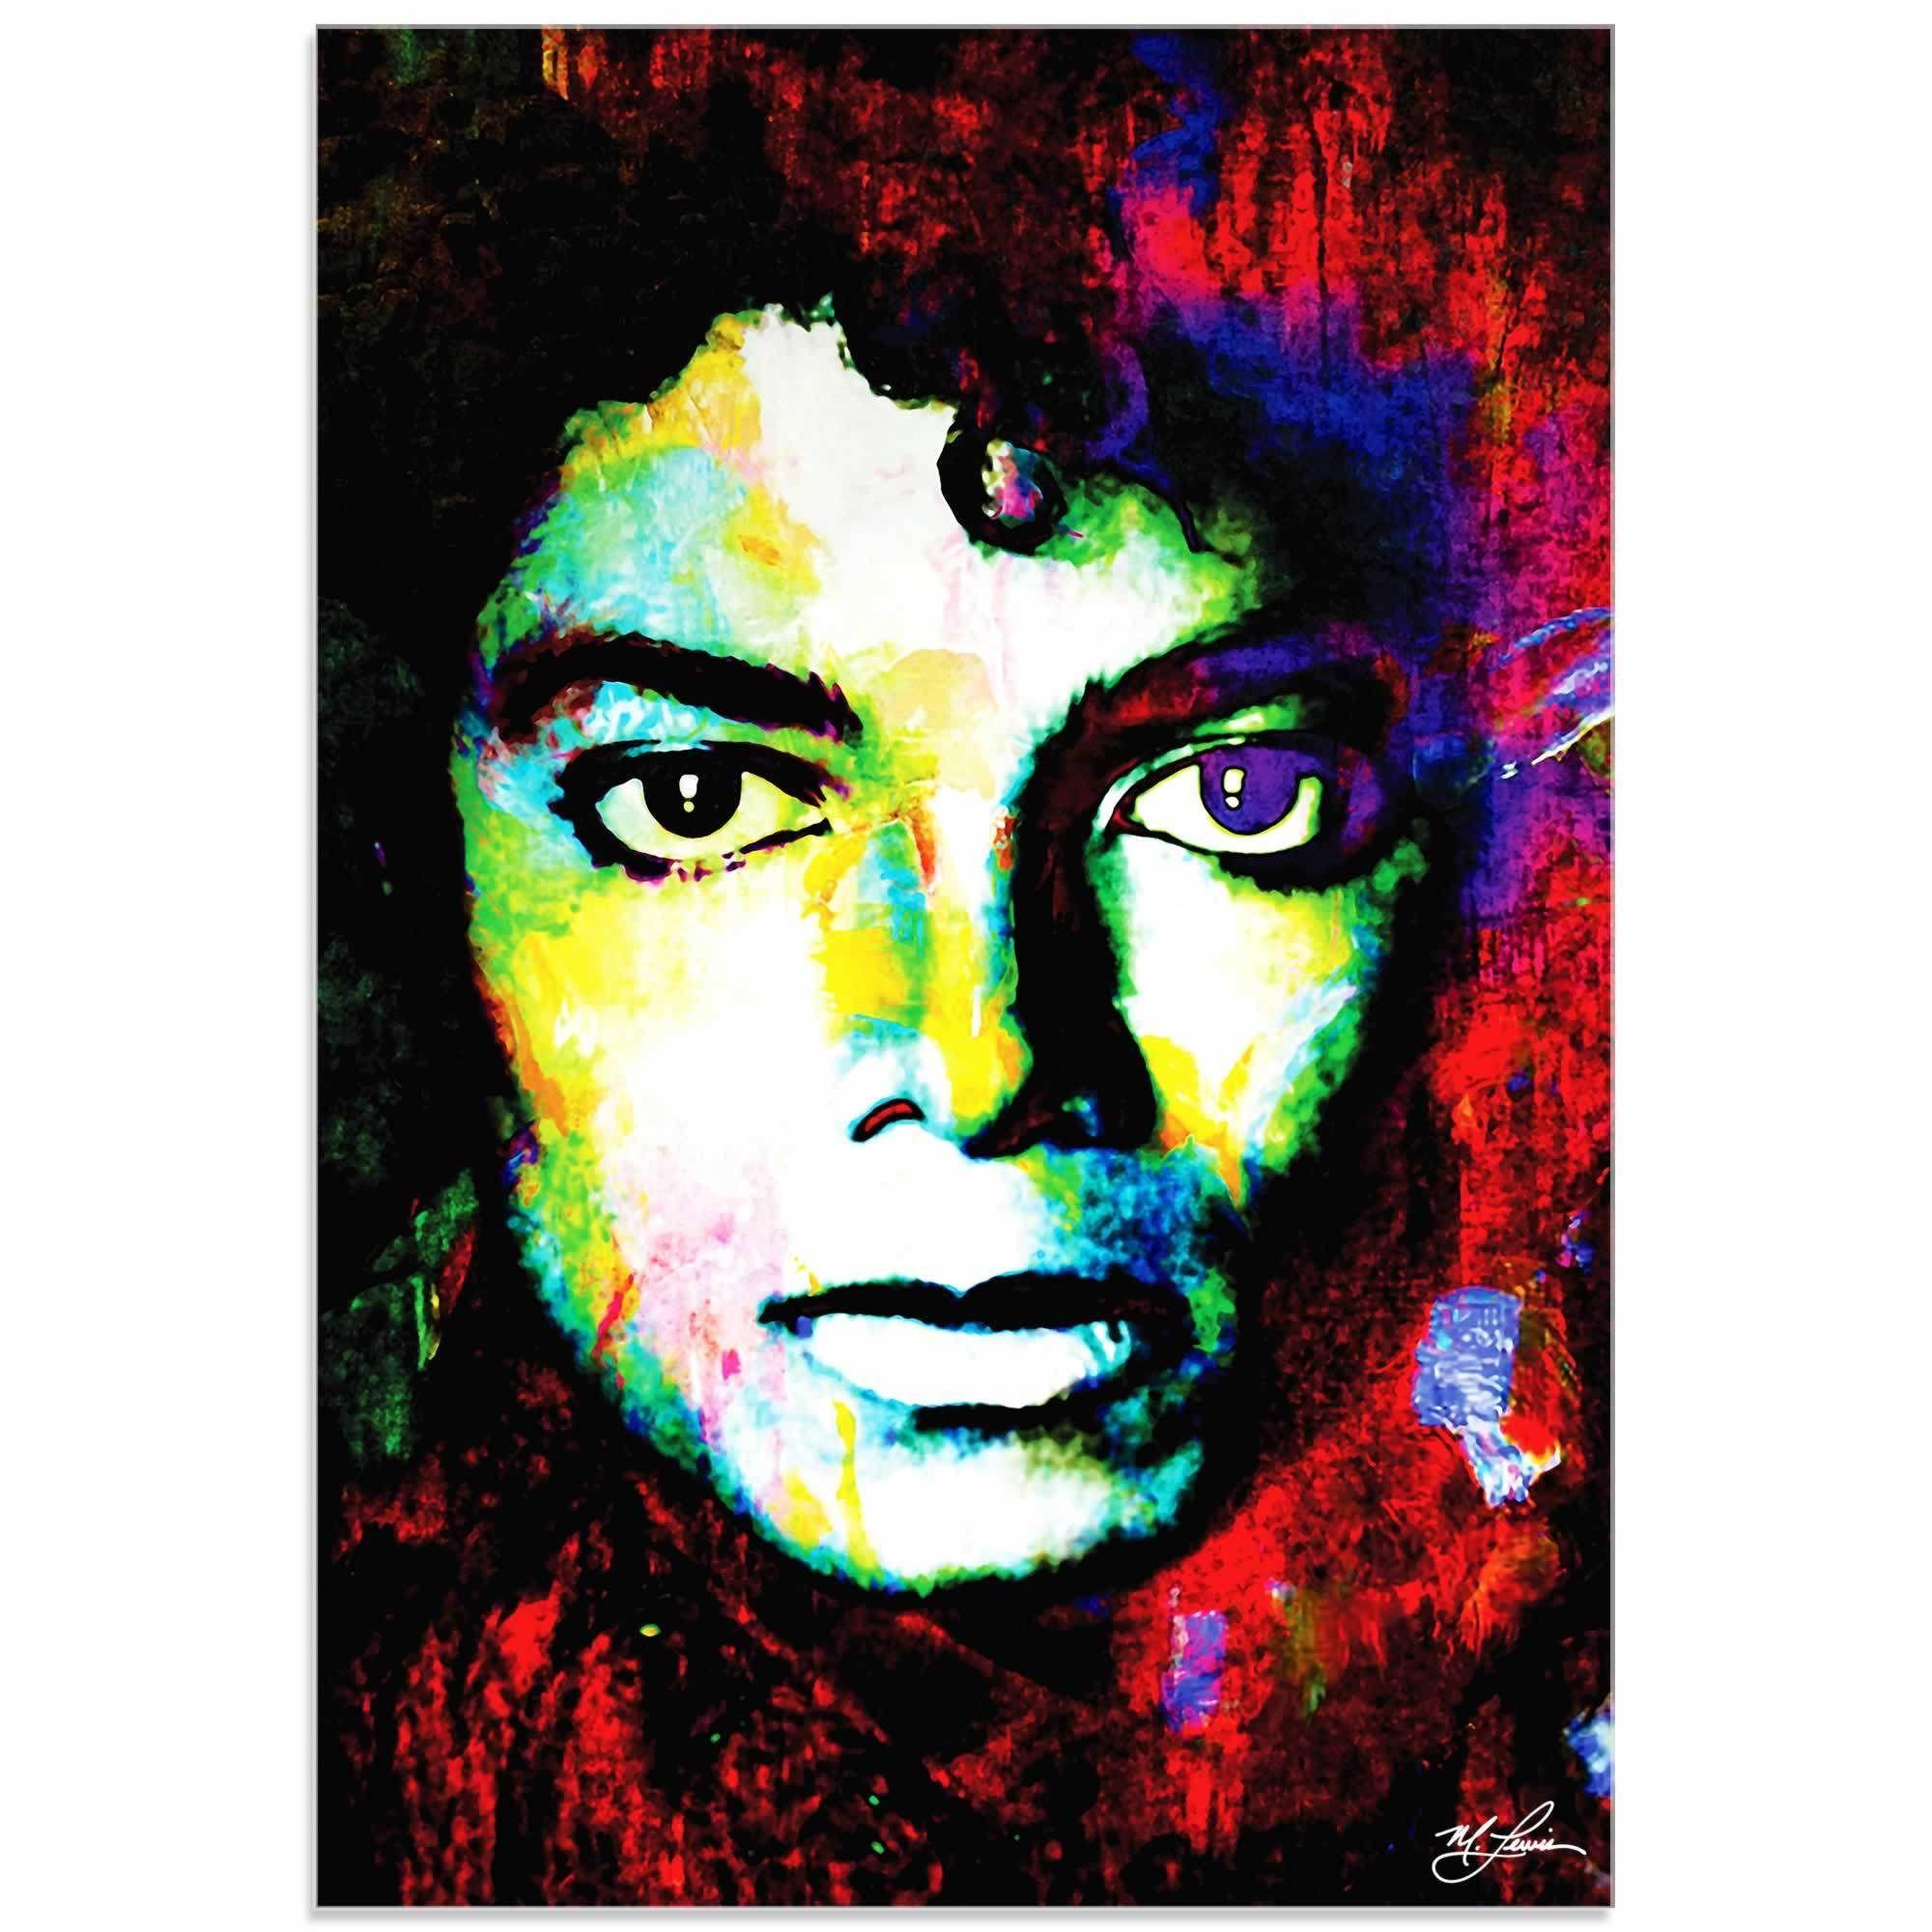 Mark Lewis 'Michael Jackson Study' Limited Edition Pop Art